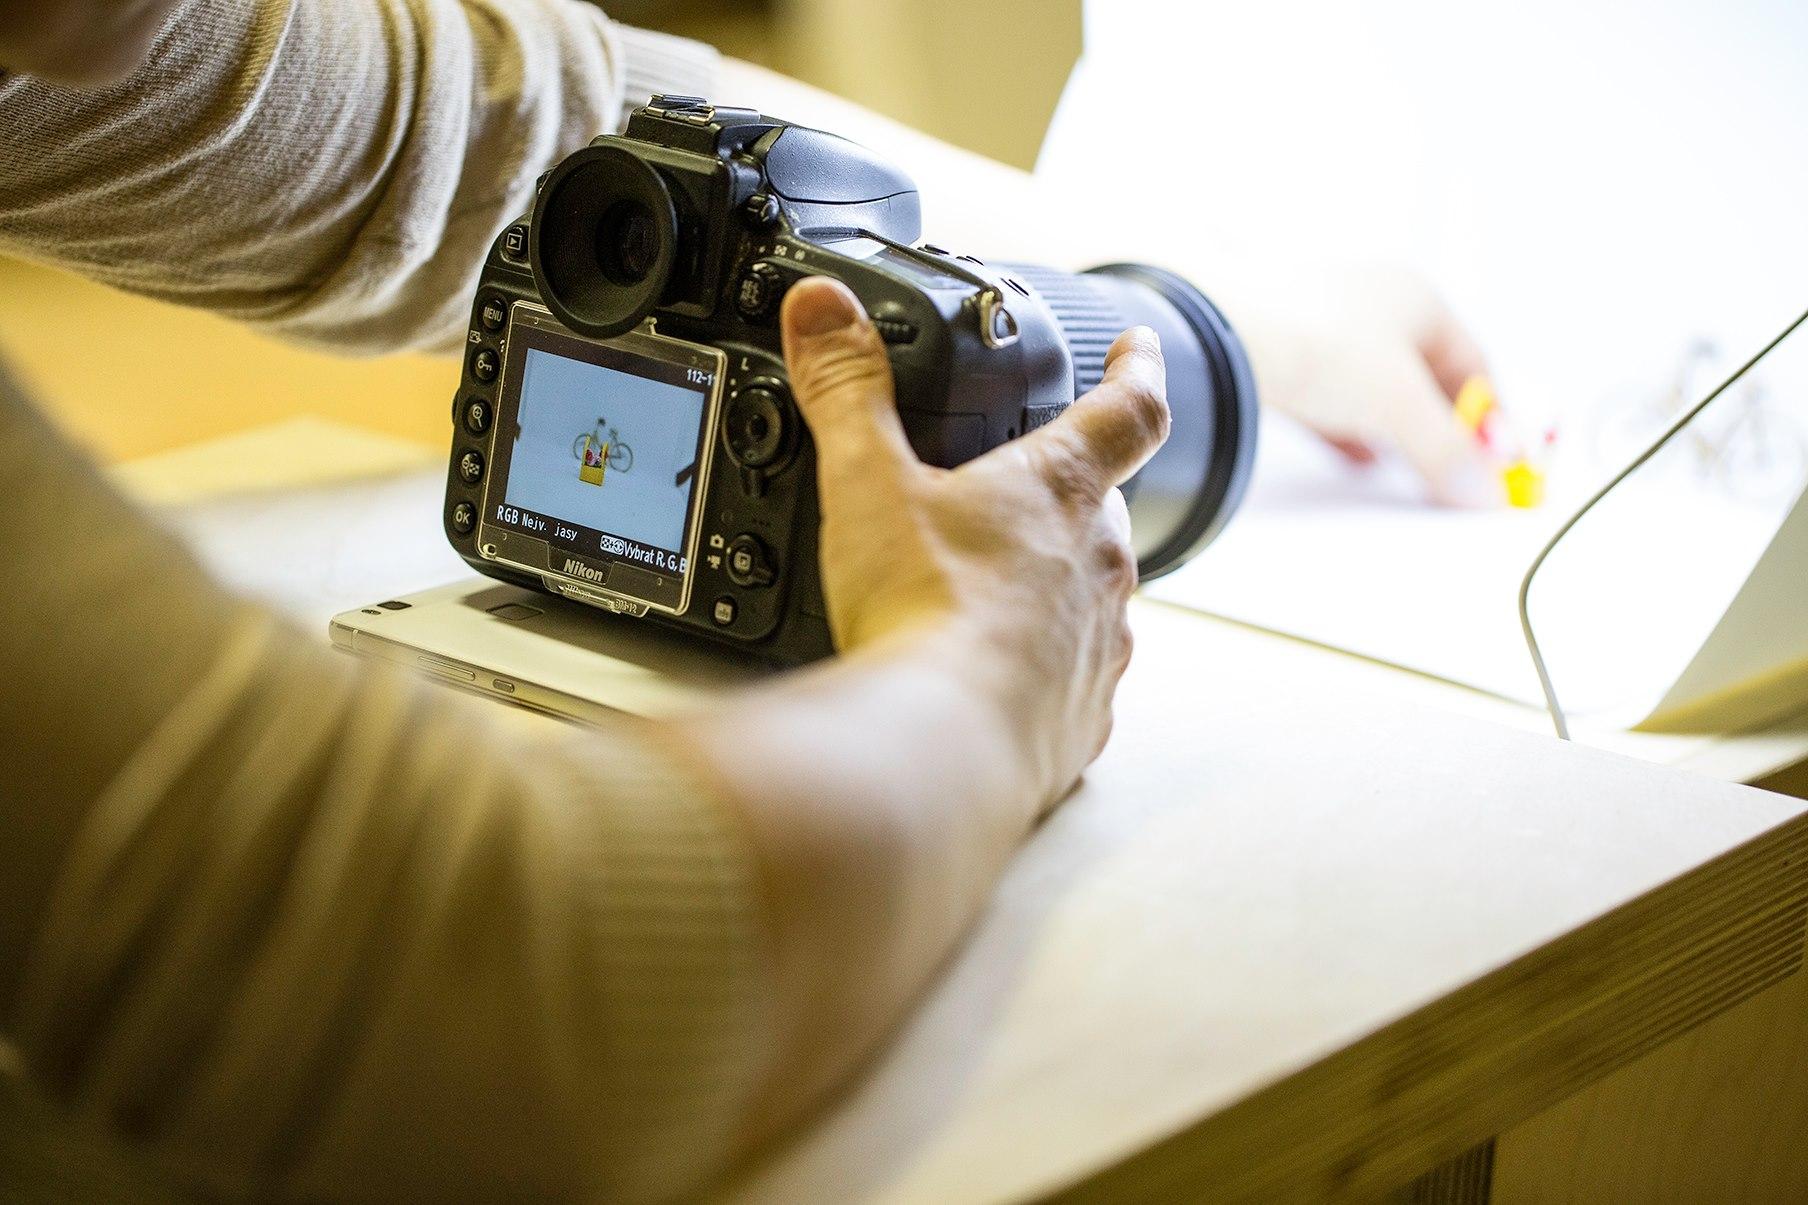 fotokruzok-levice-fotokurzy-ukazky-fotiek-na-uvode-05